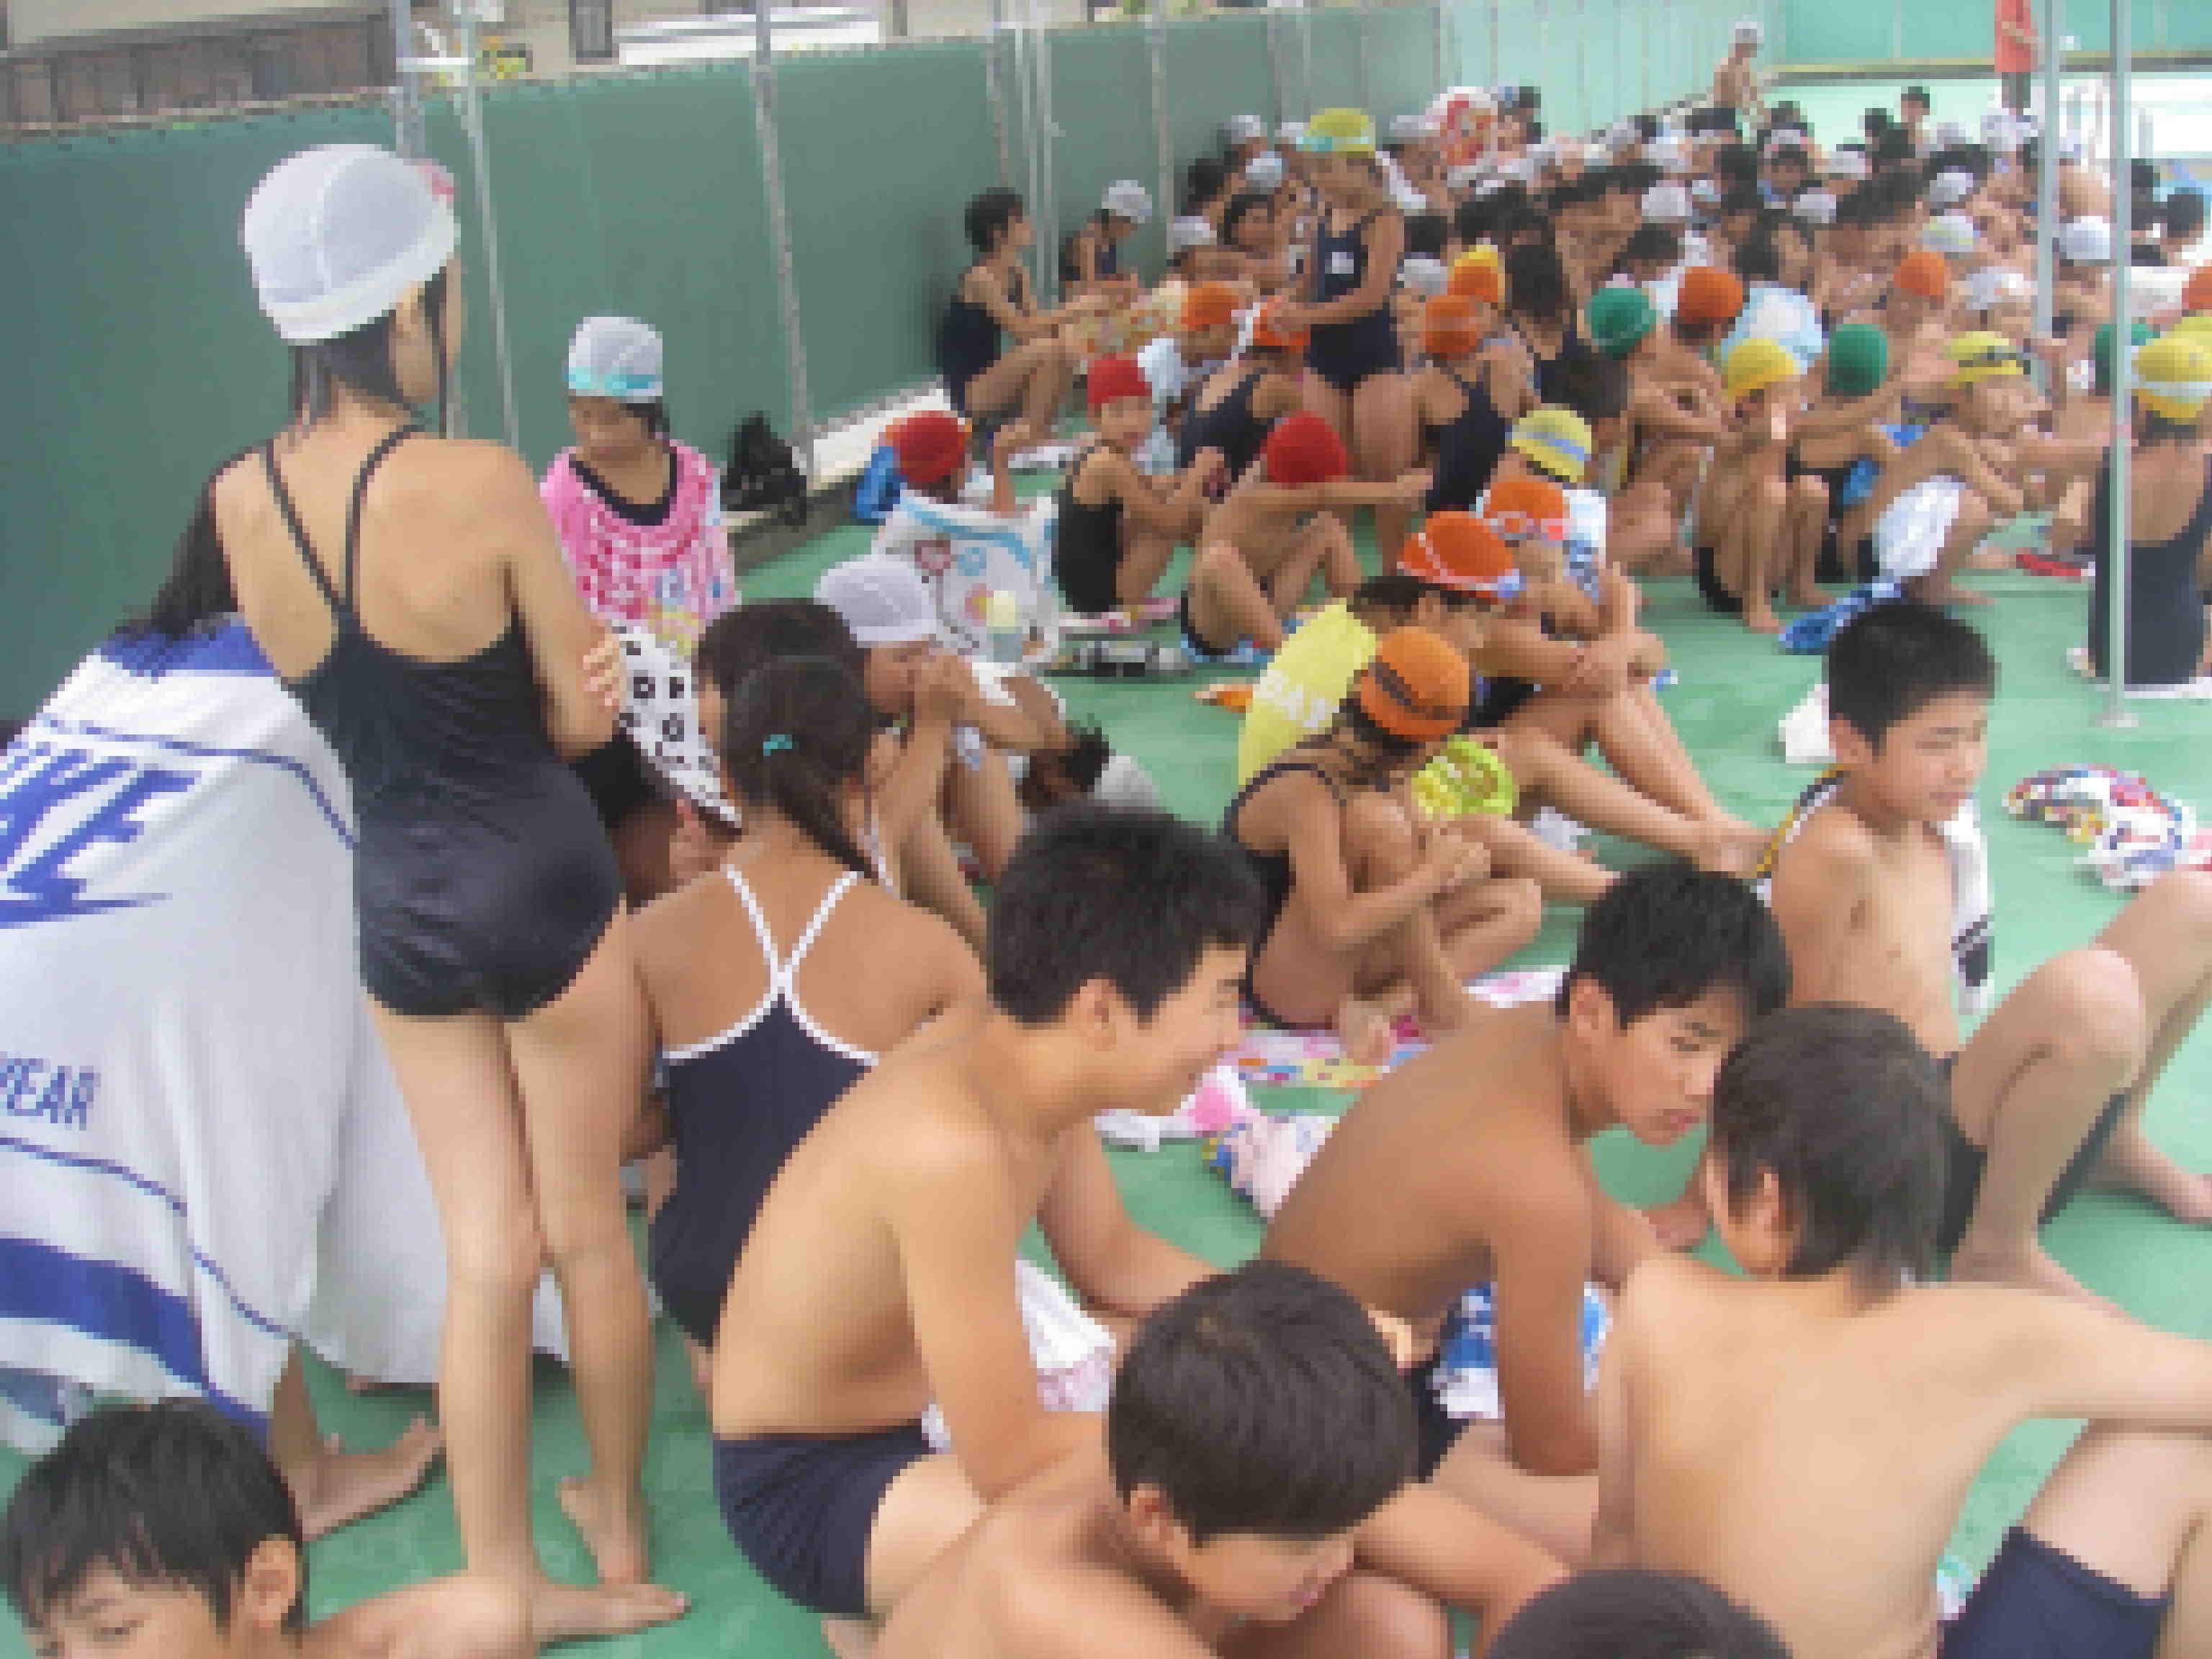 西小アルバム-西地区水泳記録会